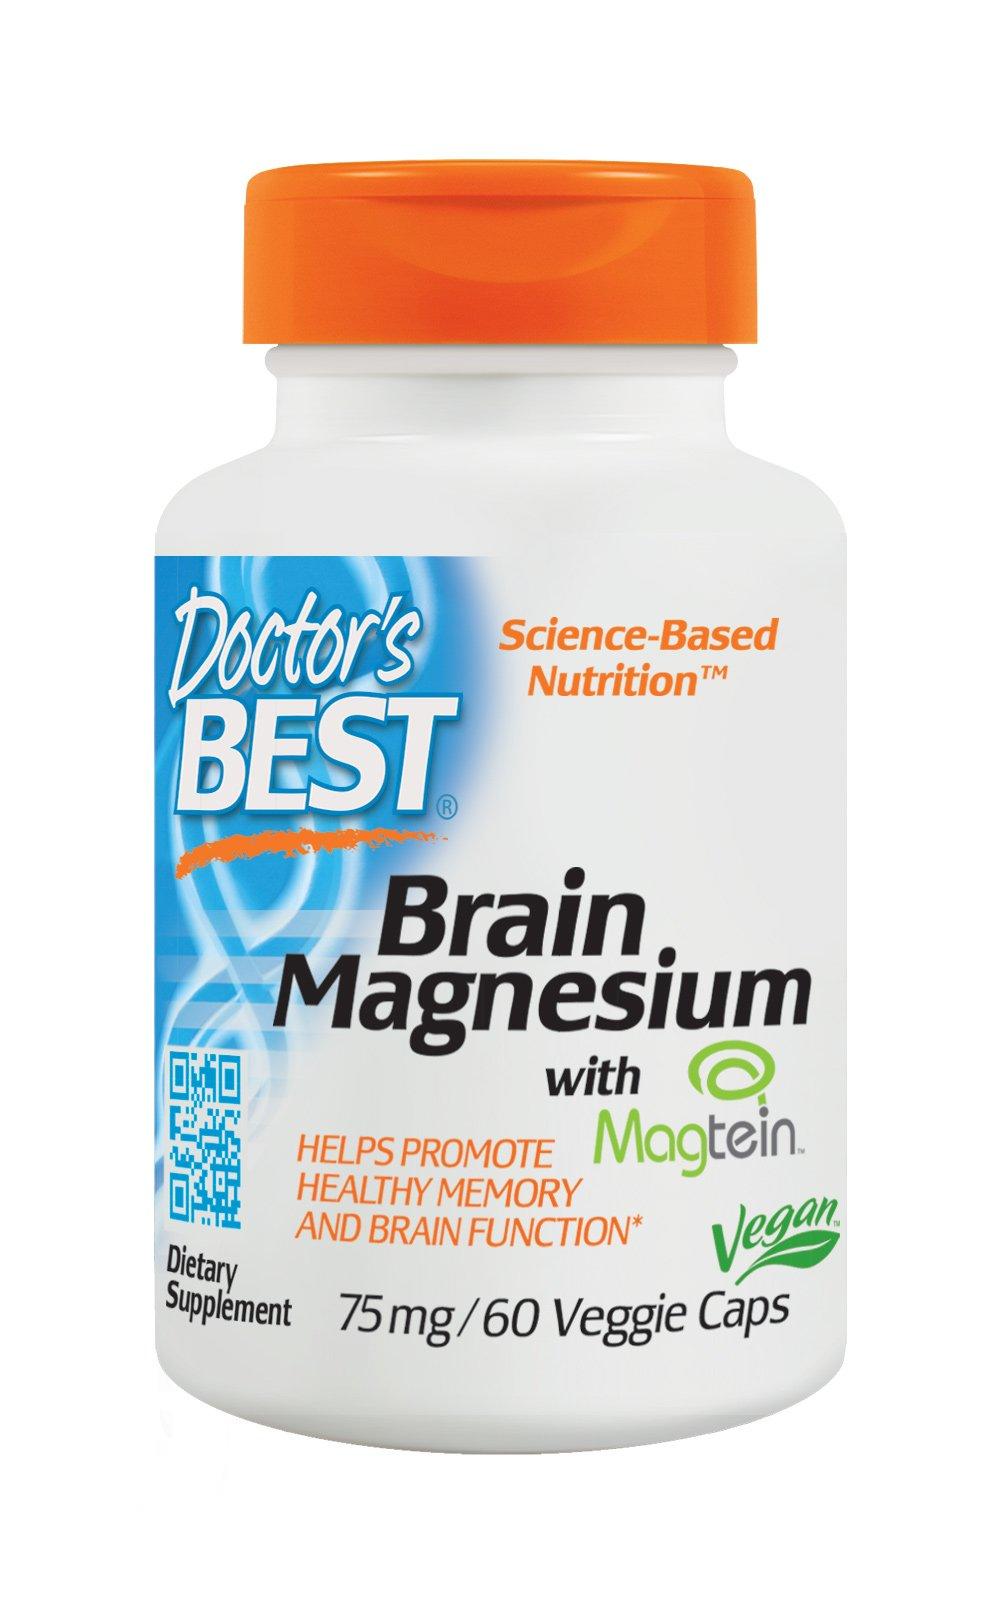 Doctor's Best Brain Magnesium, Non-GMO, Vegan, Gluten Free, 75 mg, 60 Veggie Caps